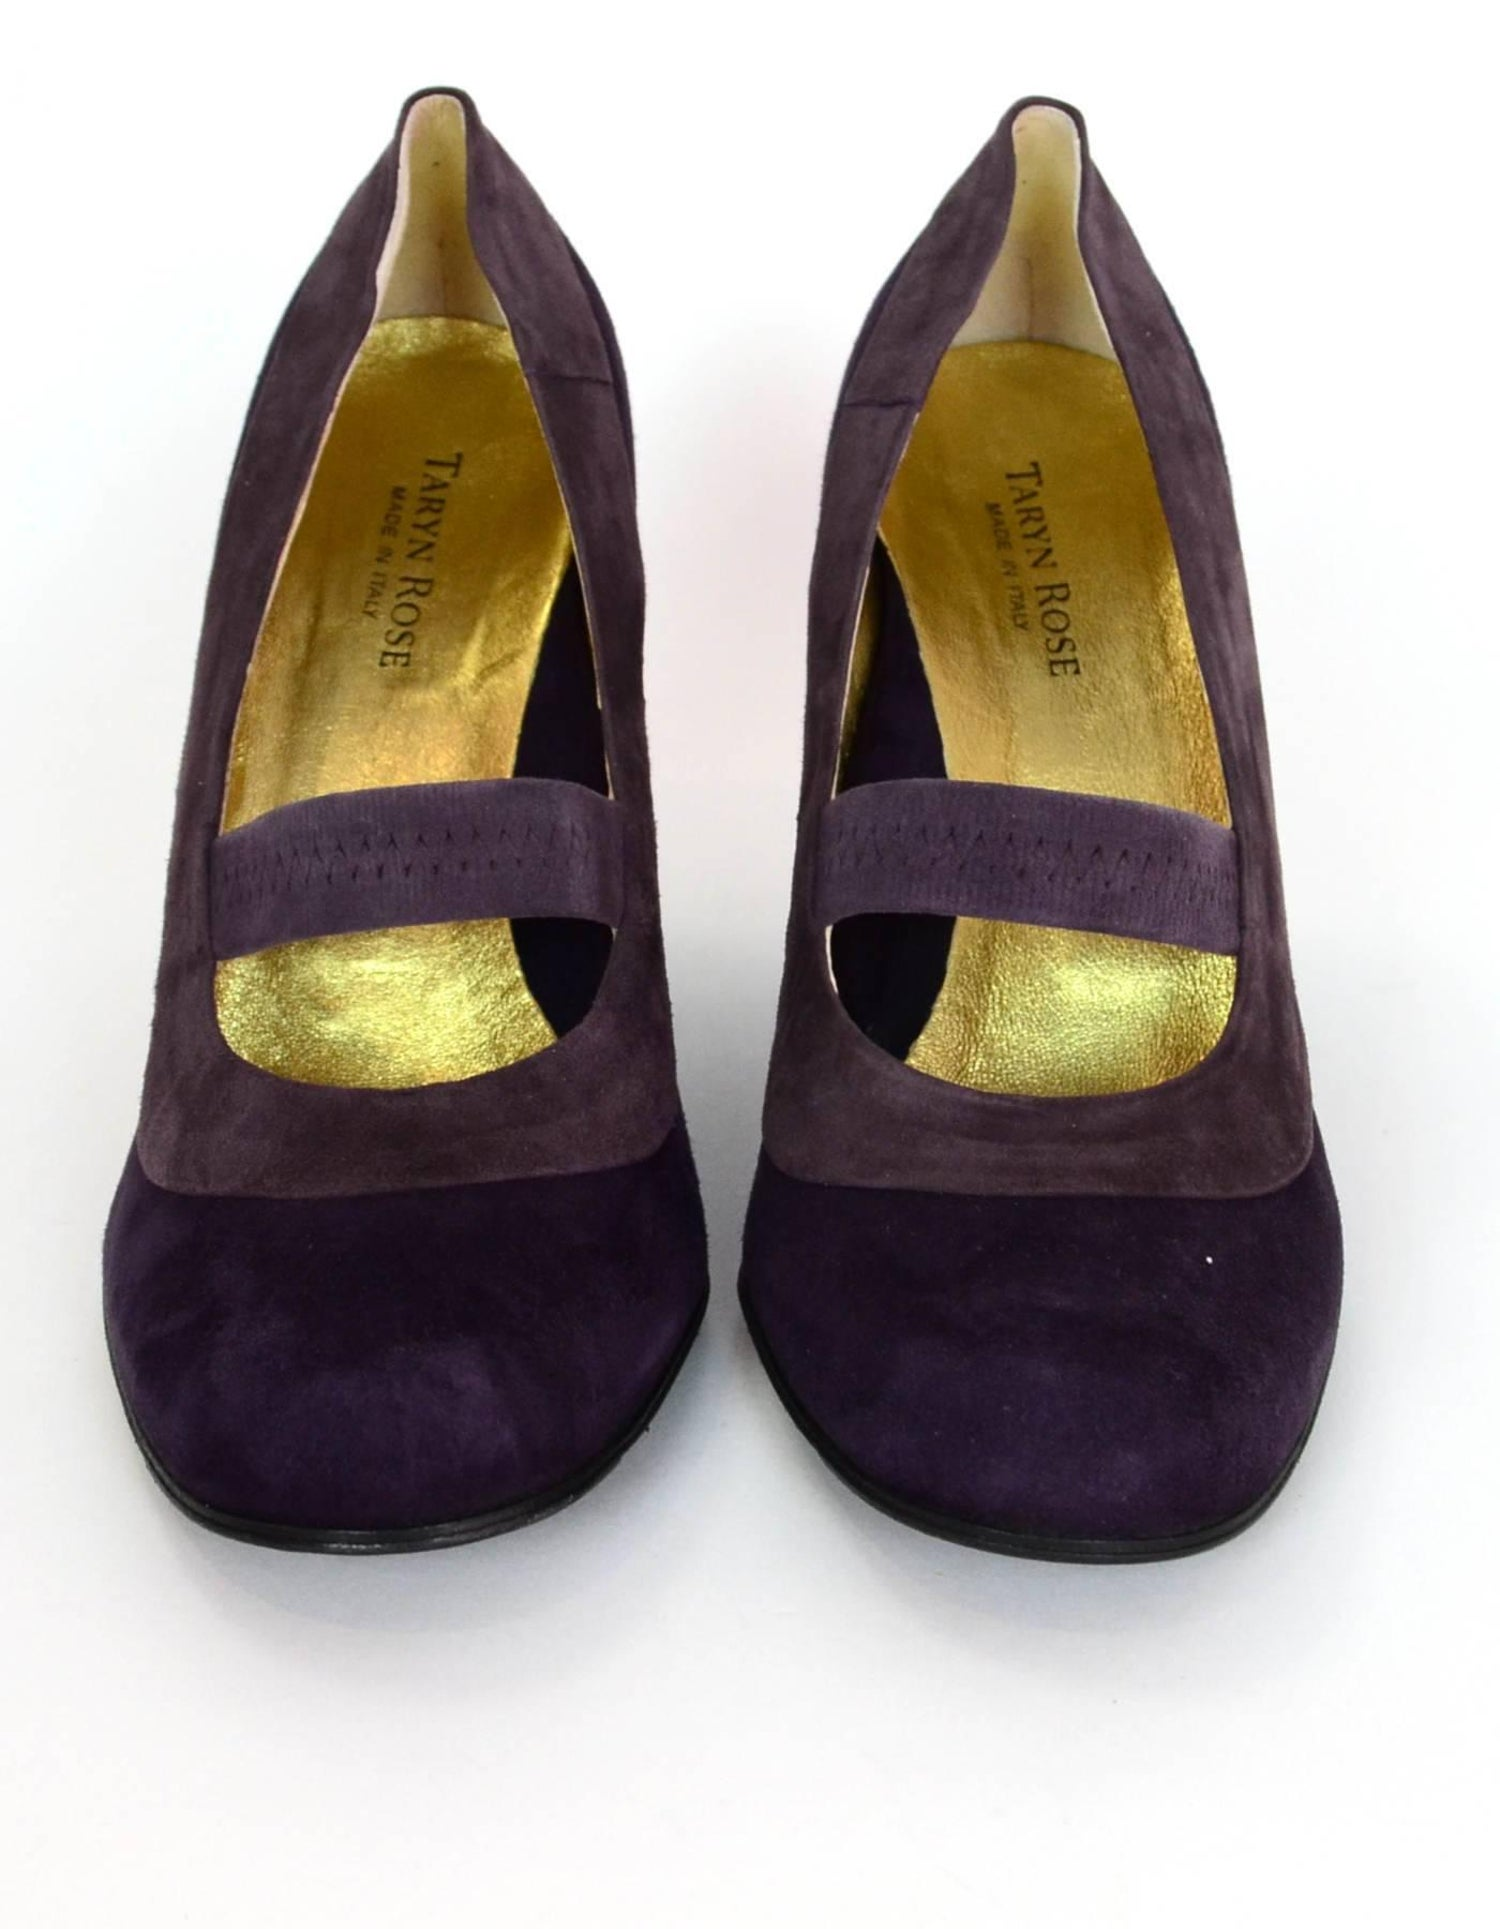 495b8b5cda7c Taryn Rose Purple Tri-Color Suede Mary Jane Wedges Sz 41 NIB For Sale at  1stdibs